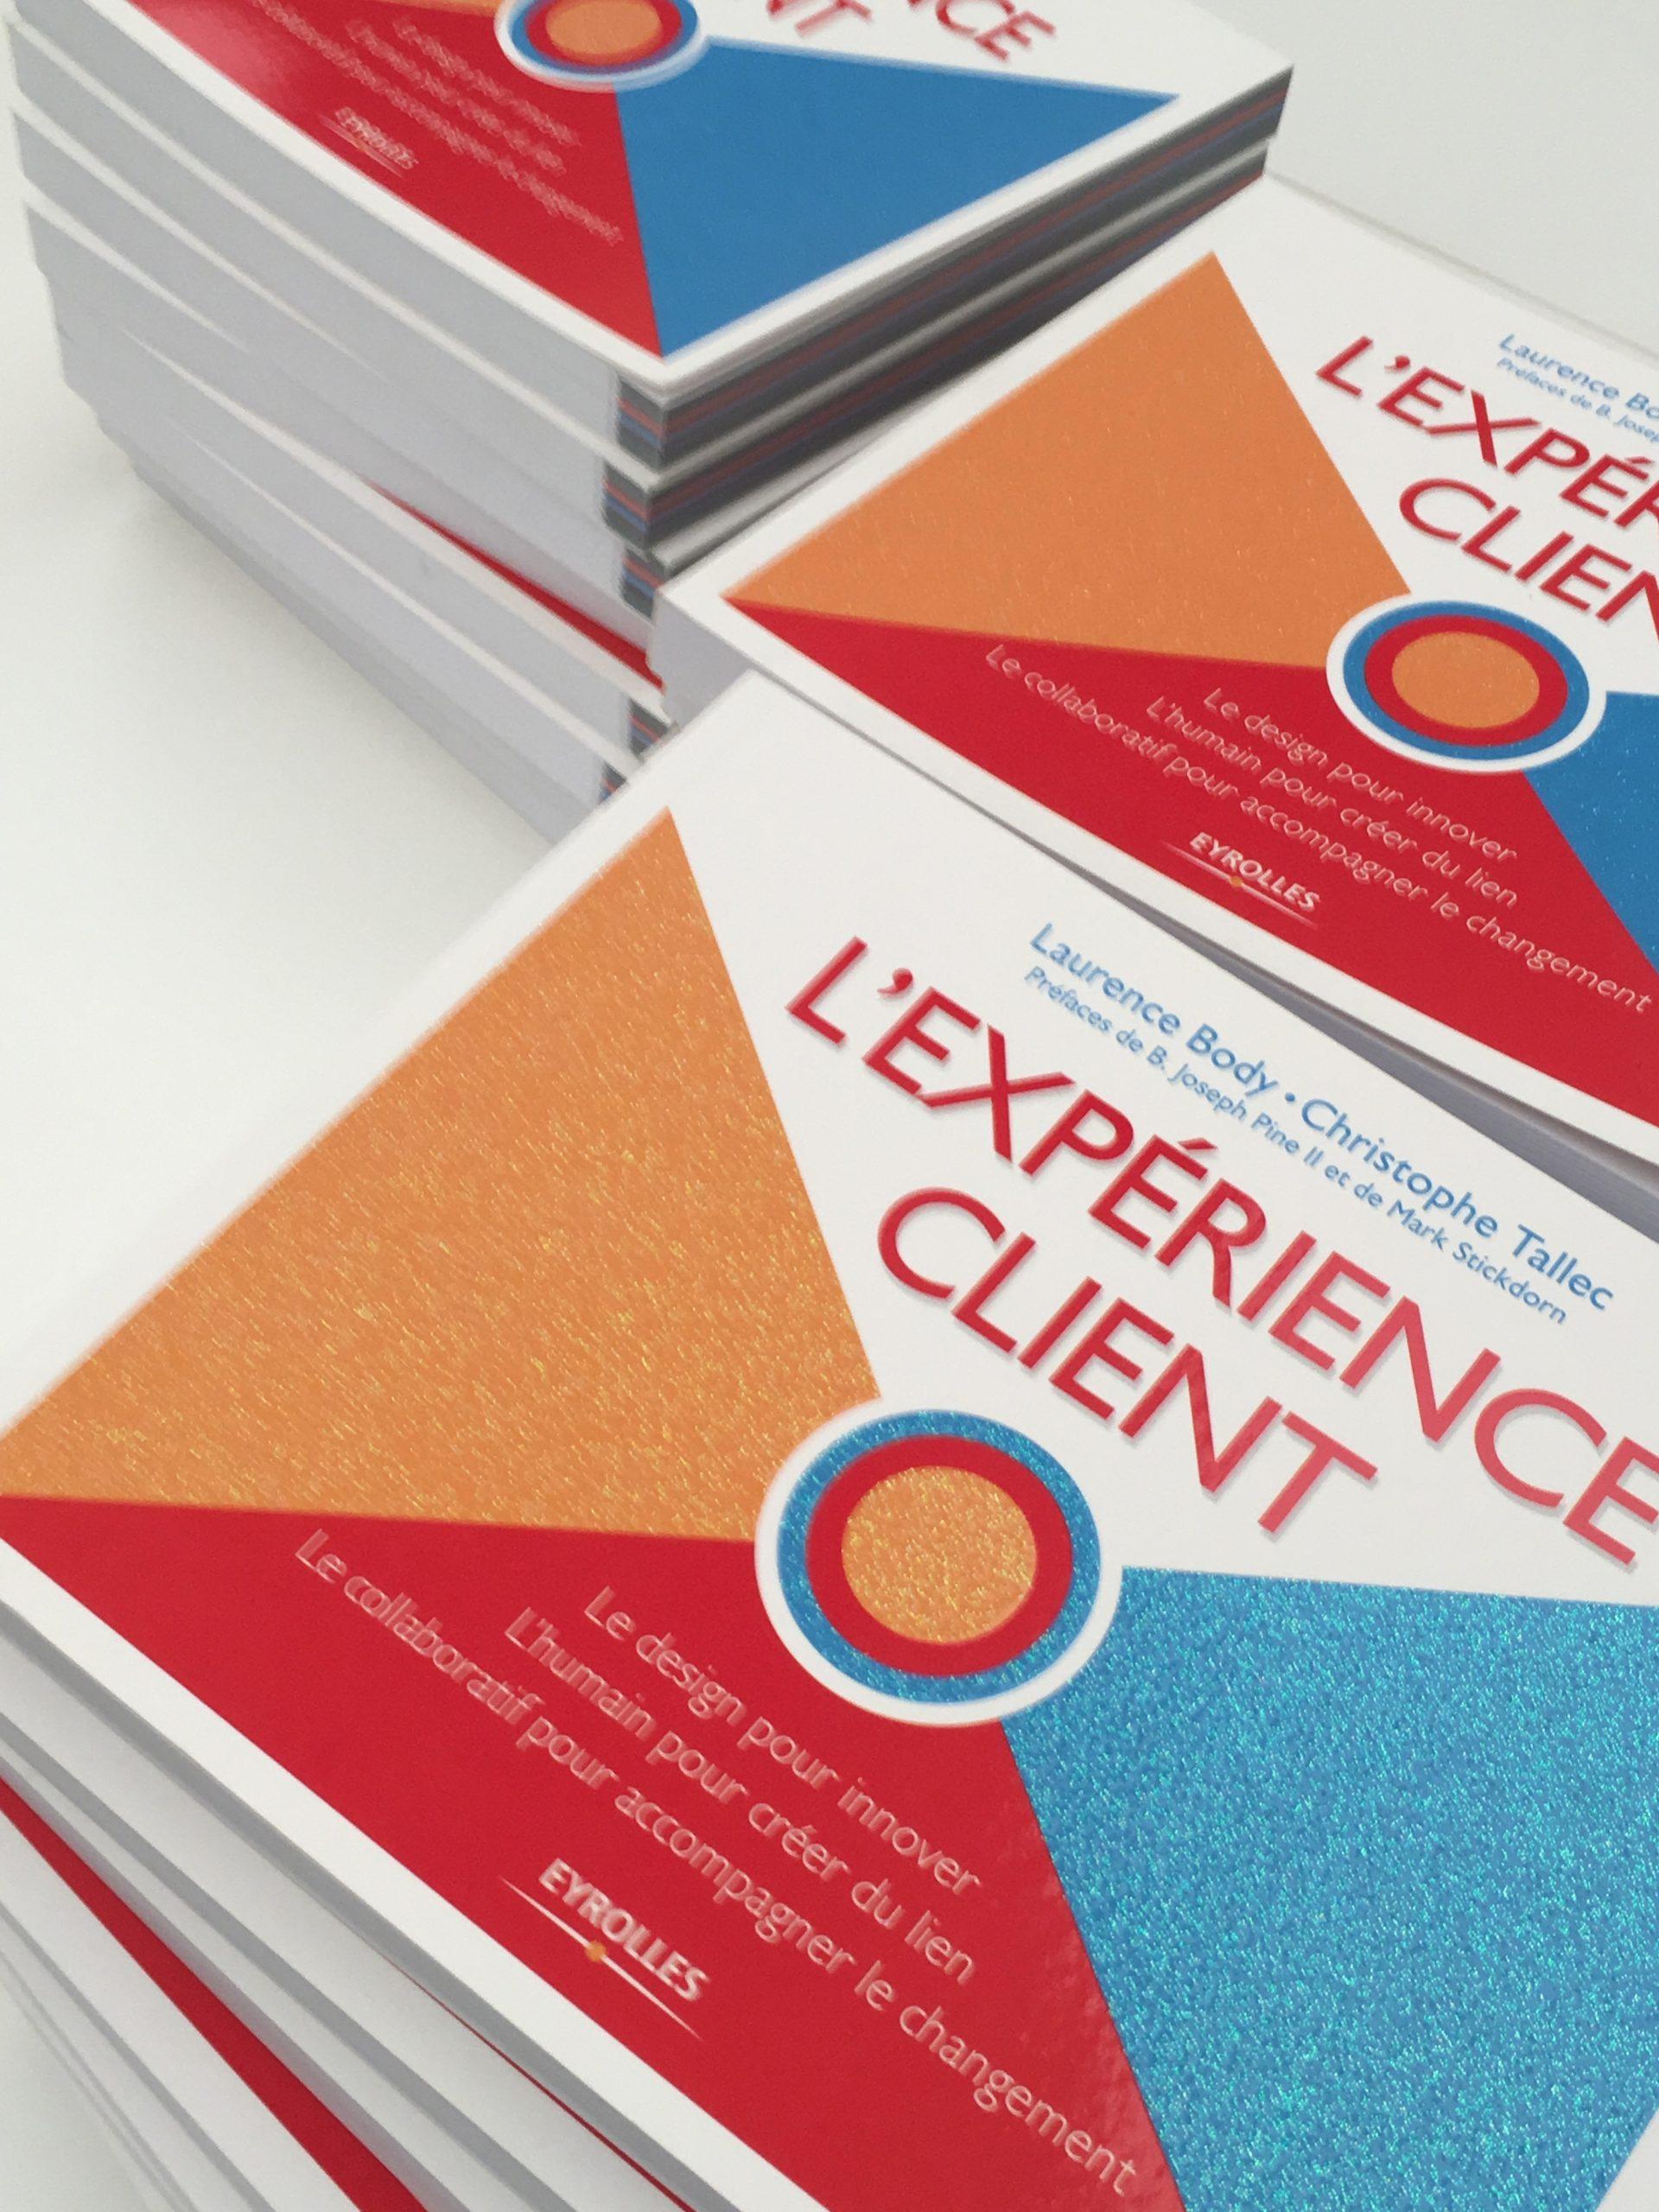 Livre Expérience Client offert